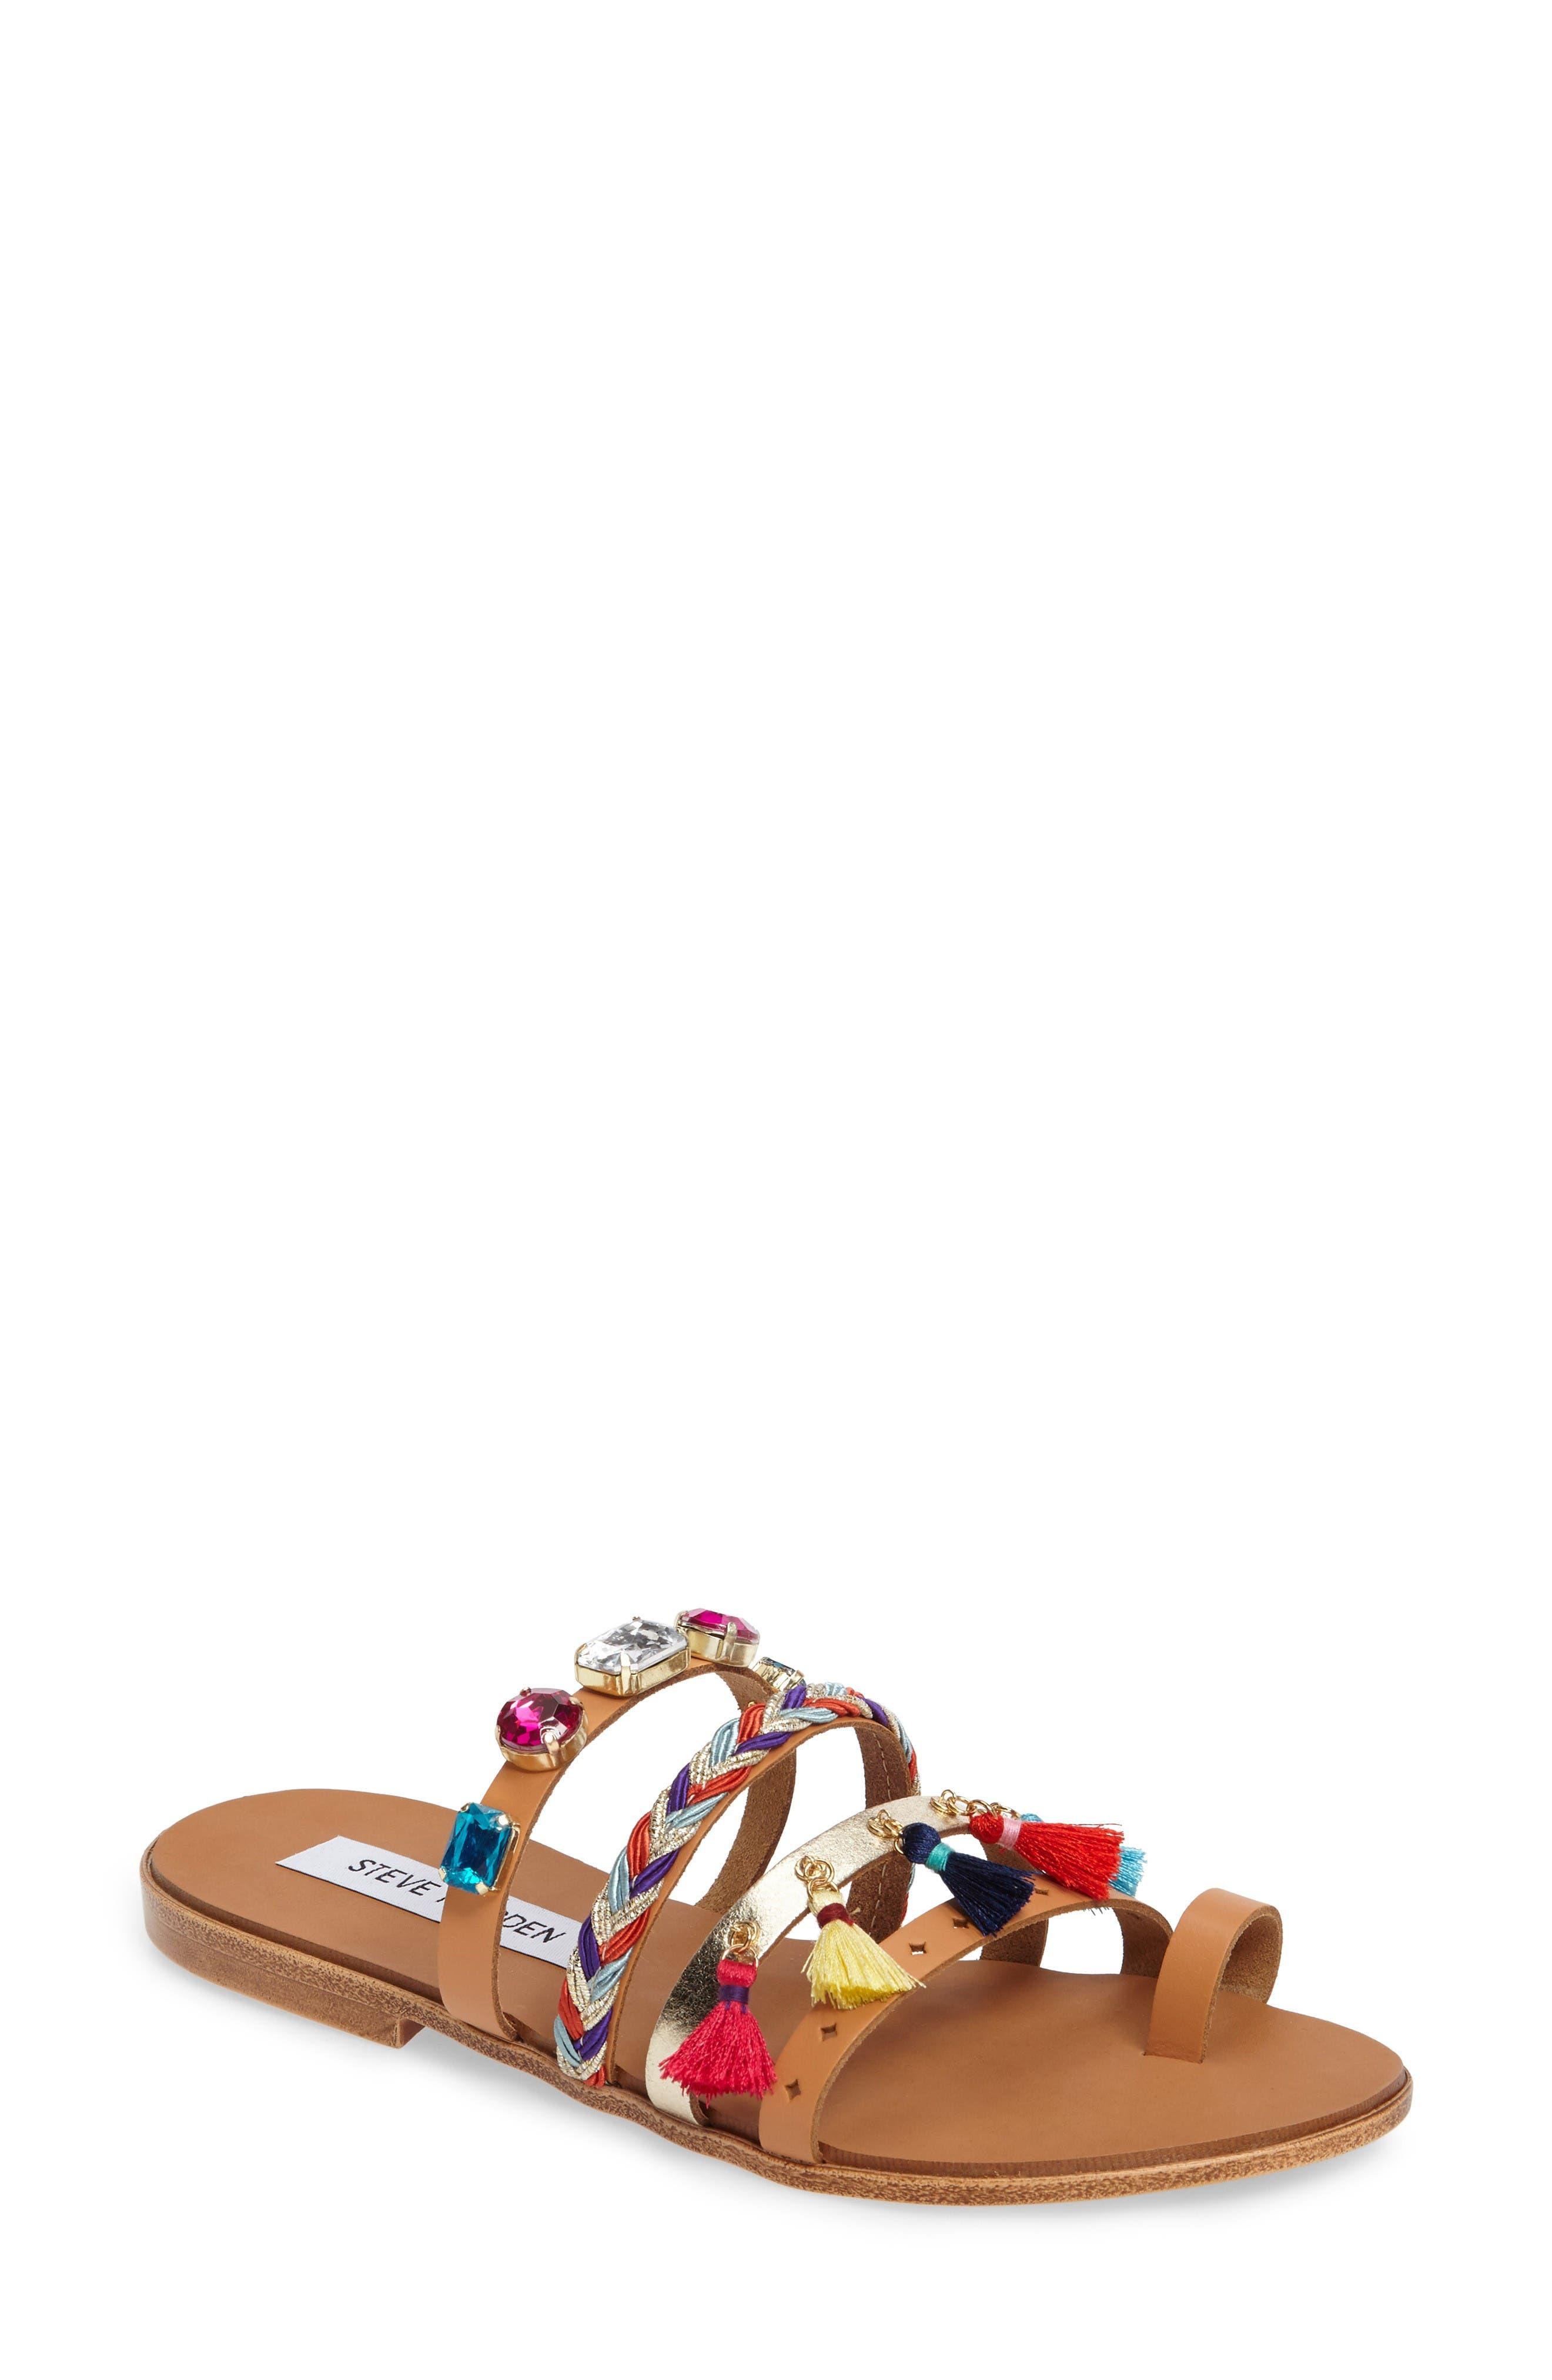 Main Image - Steve Madden Cary Embellished Sandal (Women)